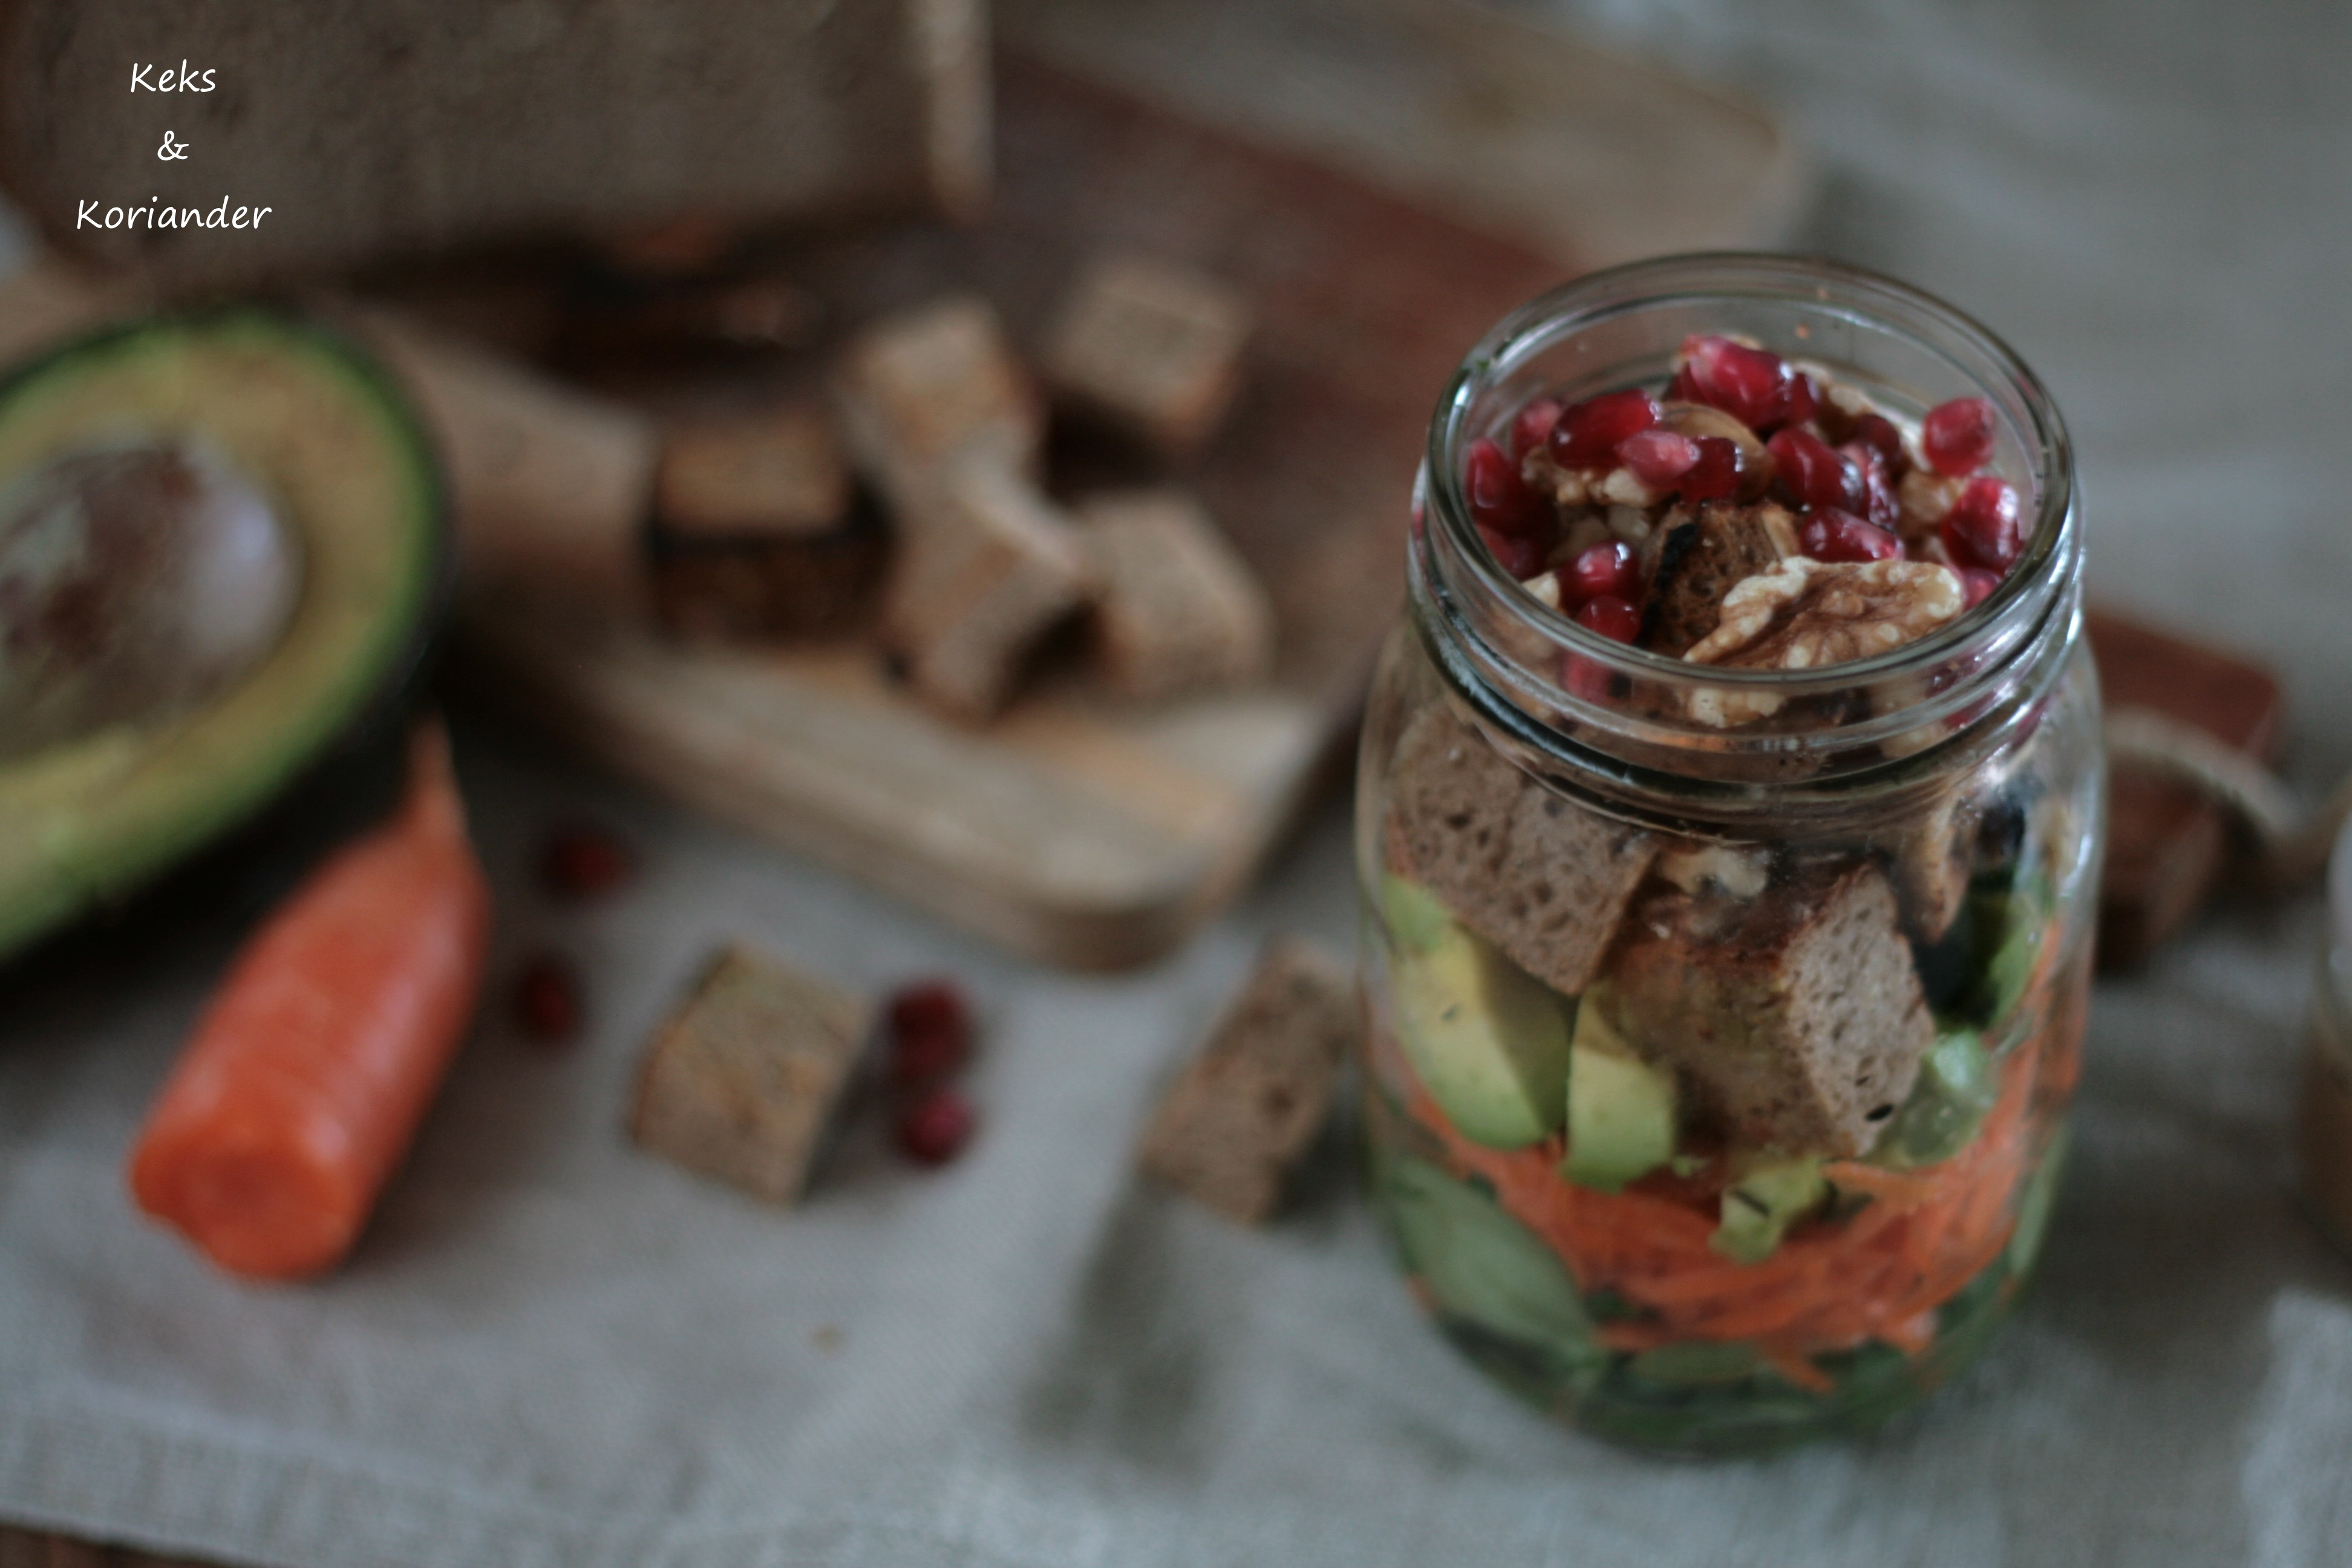 Brotsalat zum Mitnehmen mit Granatapfel, Avocado, Karotte, Feldsalat, Walnüssen 3